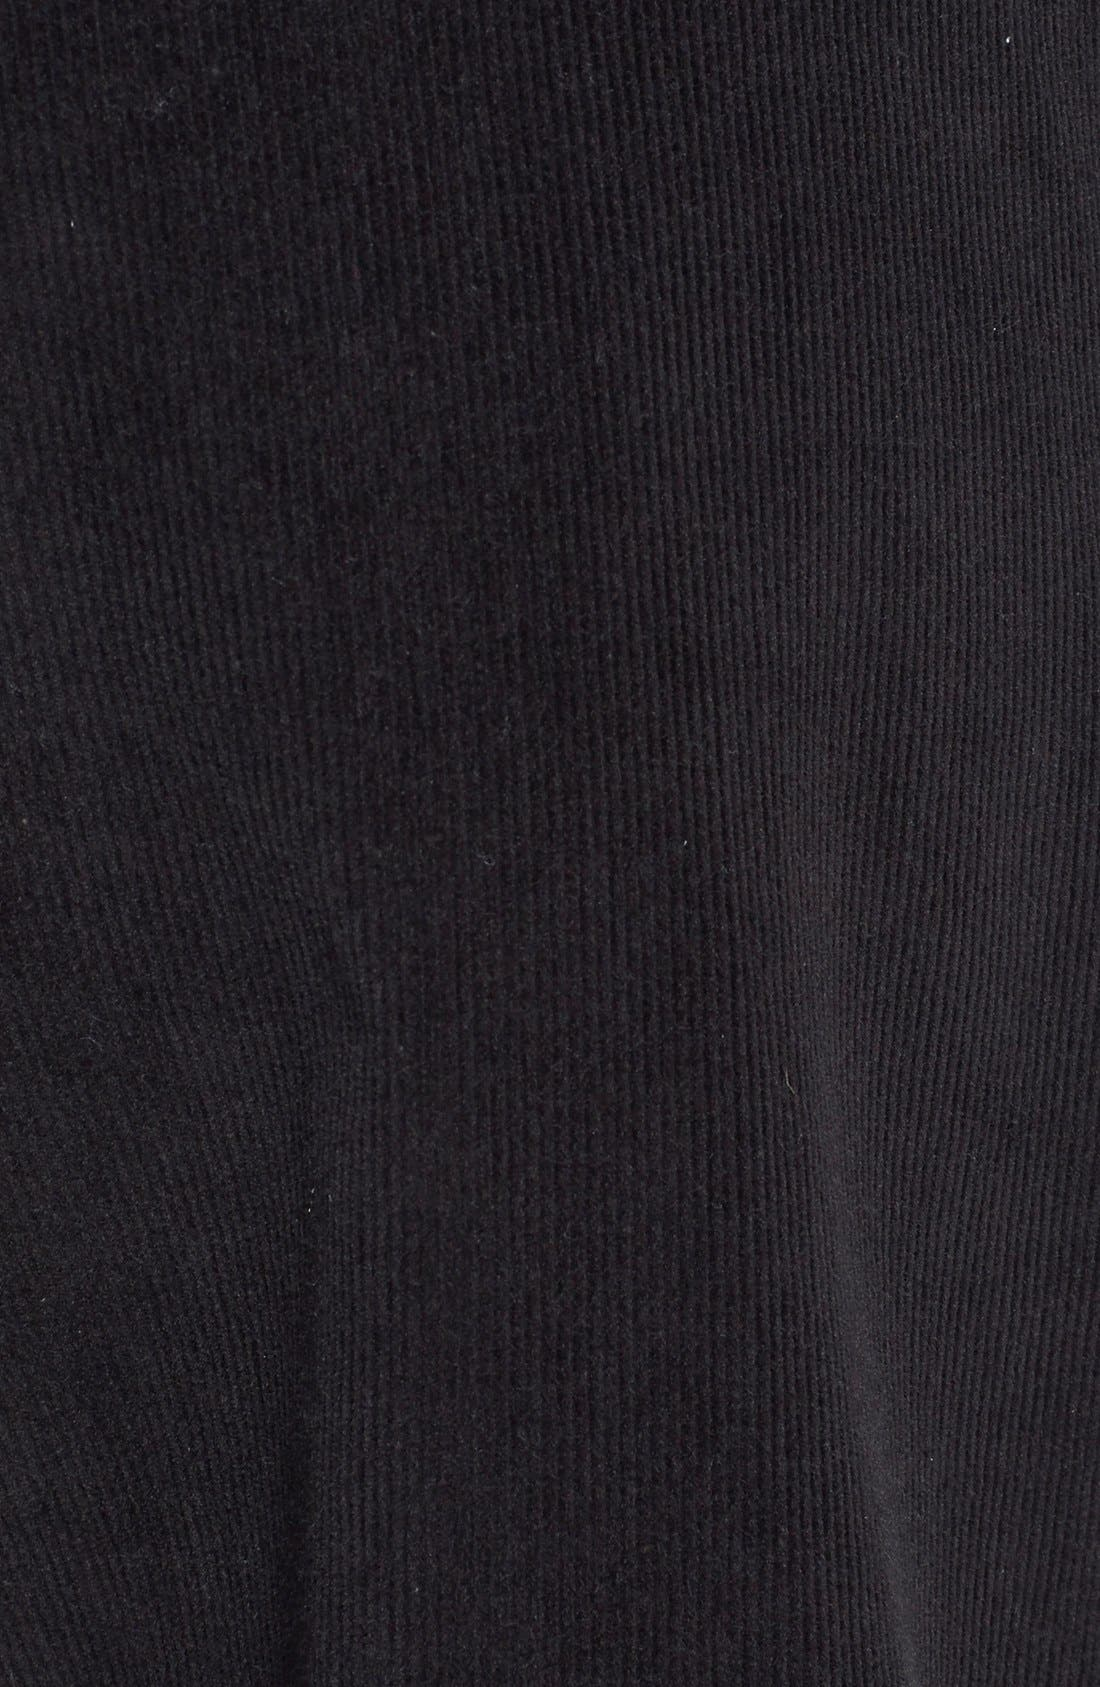 'Walker' Flat Front Straight Leg Corduroy Pants,                             Alternate thumbnail 2, color,                             001